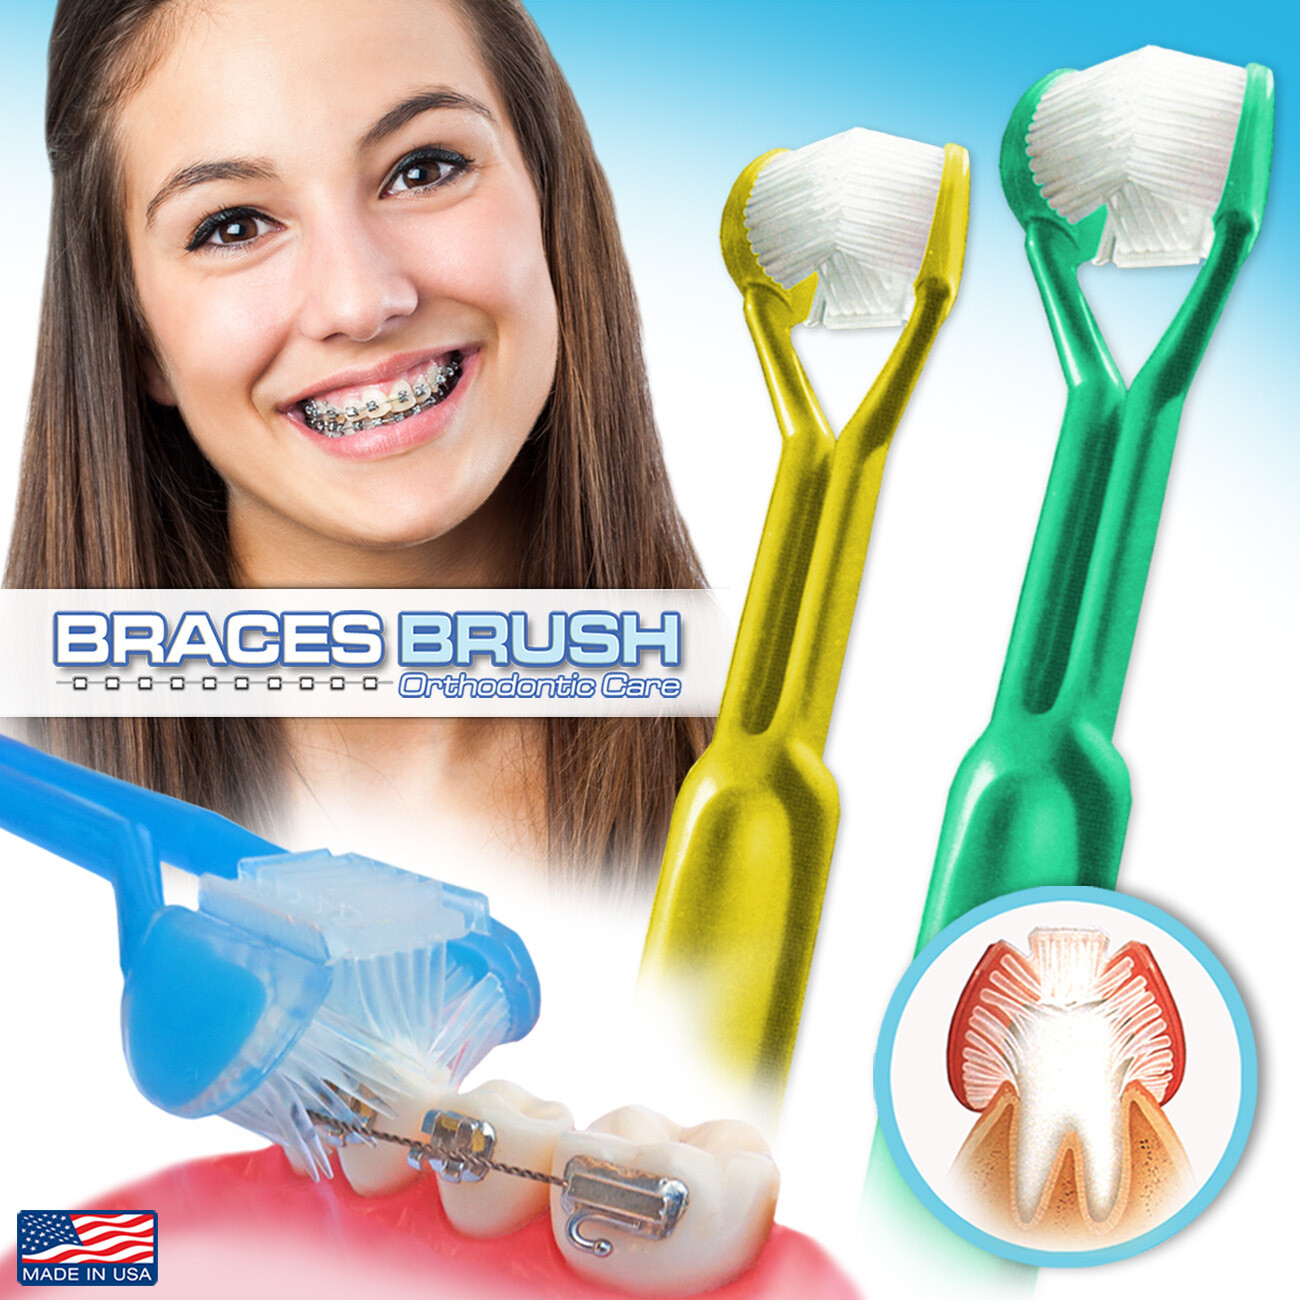 2-PK | DenTrust 3-Sided Braces Brush | The Only Toothbrush Clinically Proven Better for Orthodontic Brackets | Easily Brush Better & Prevent Gum Disease | Tongue Scraper for Fresh Breath | MADE IN USA